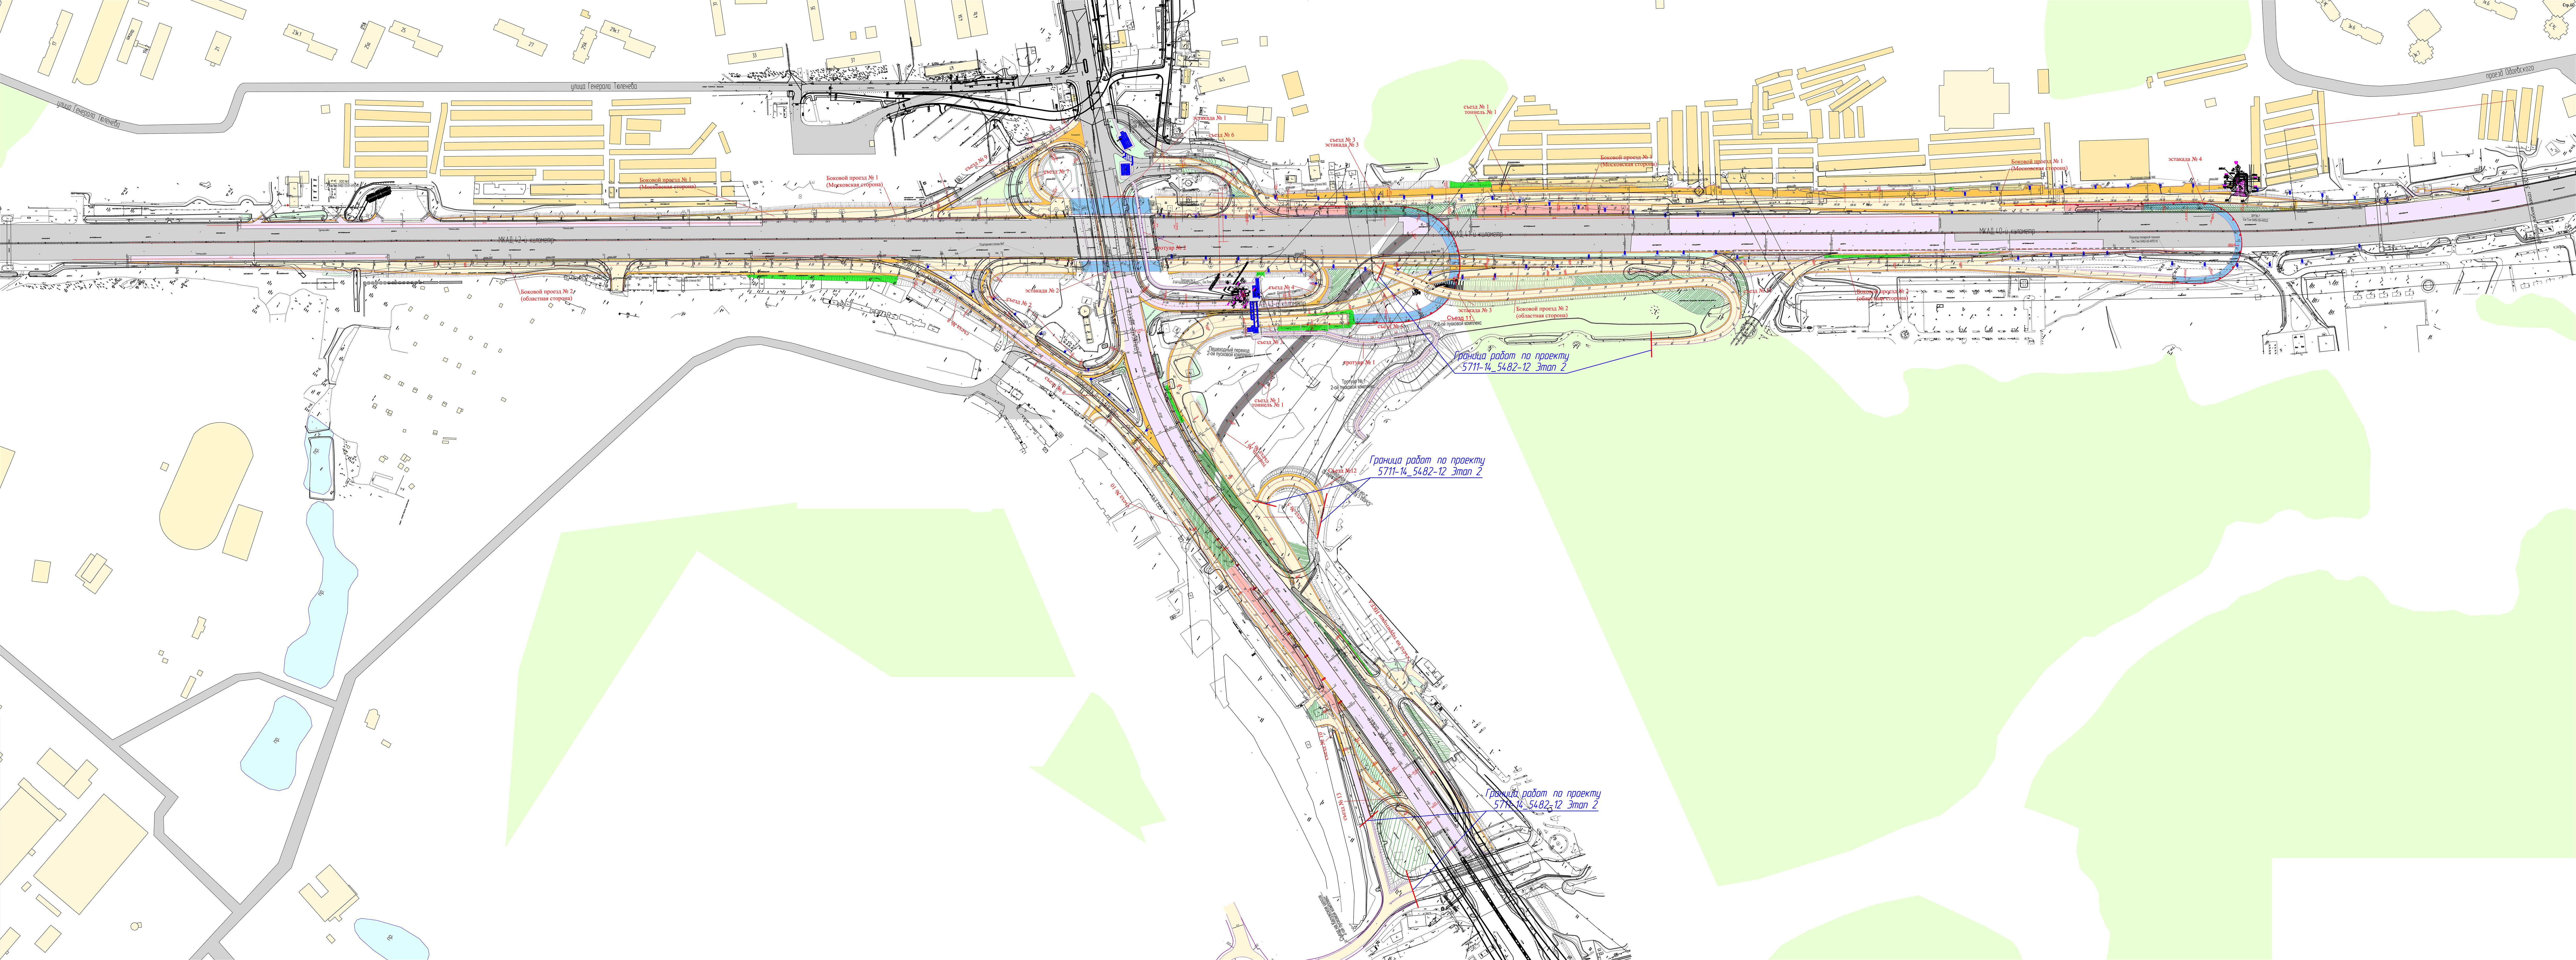 Развязка на калужском шоссе и мкад схема